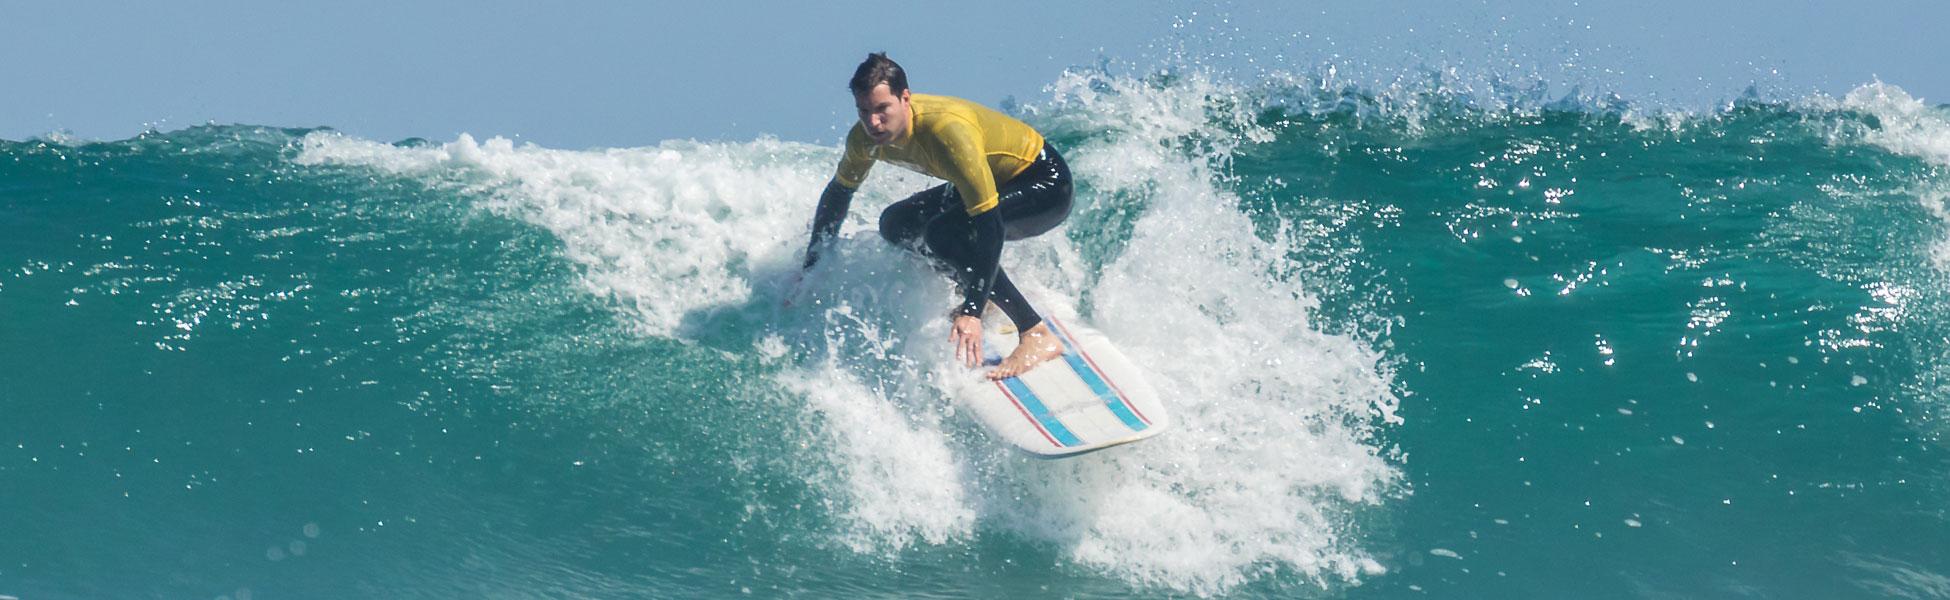 playa famara surf camp